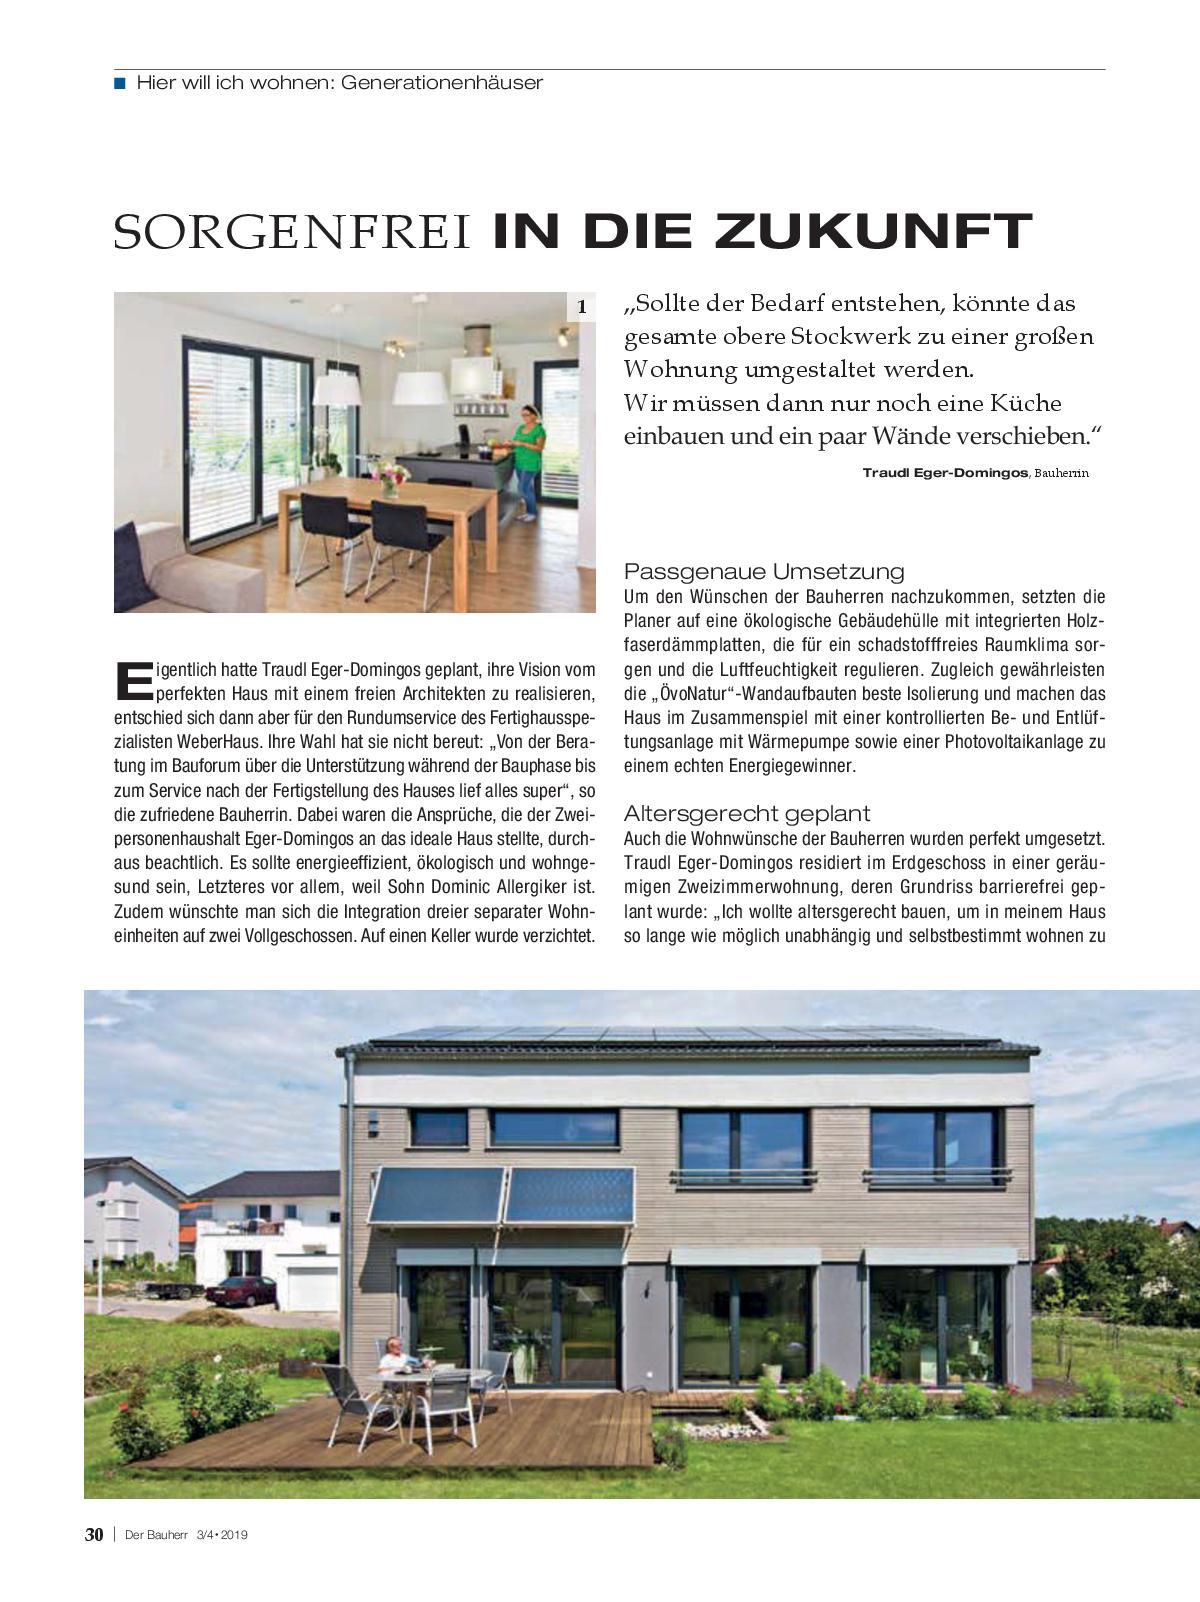 Der Bauherr Ausgabe April/ Mai 2019